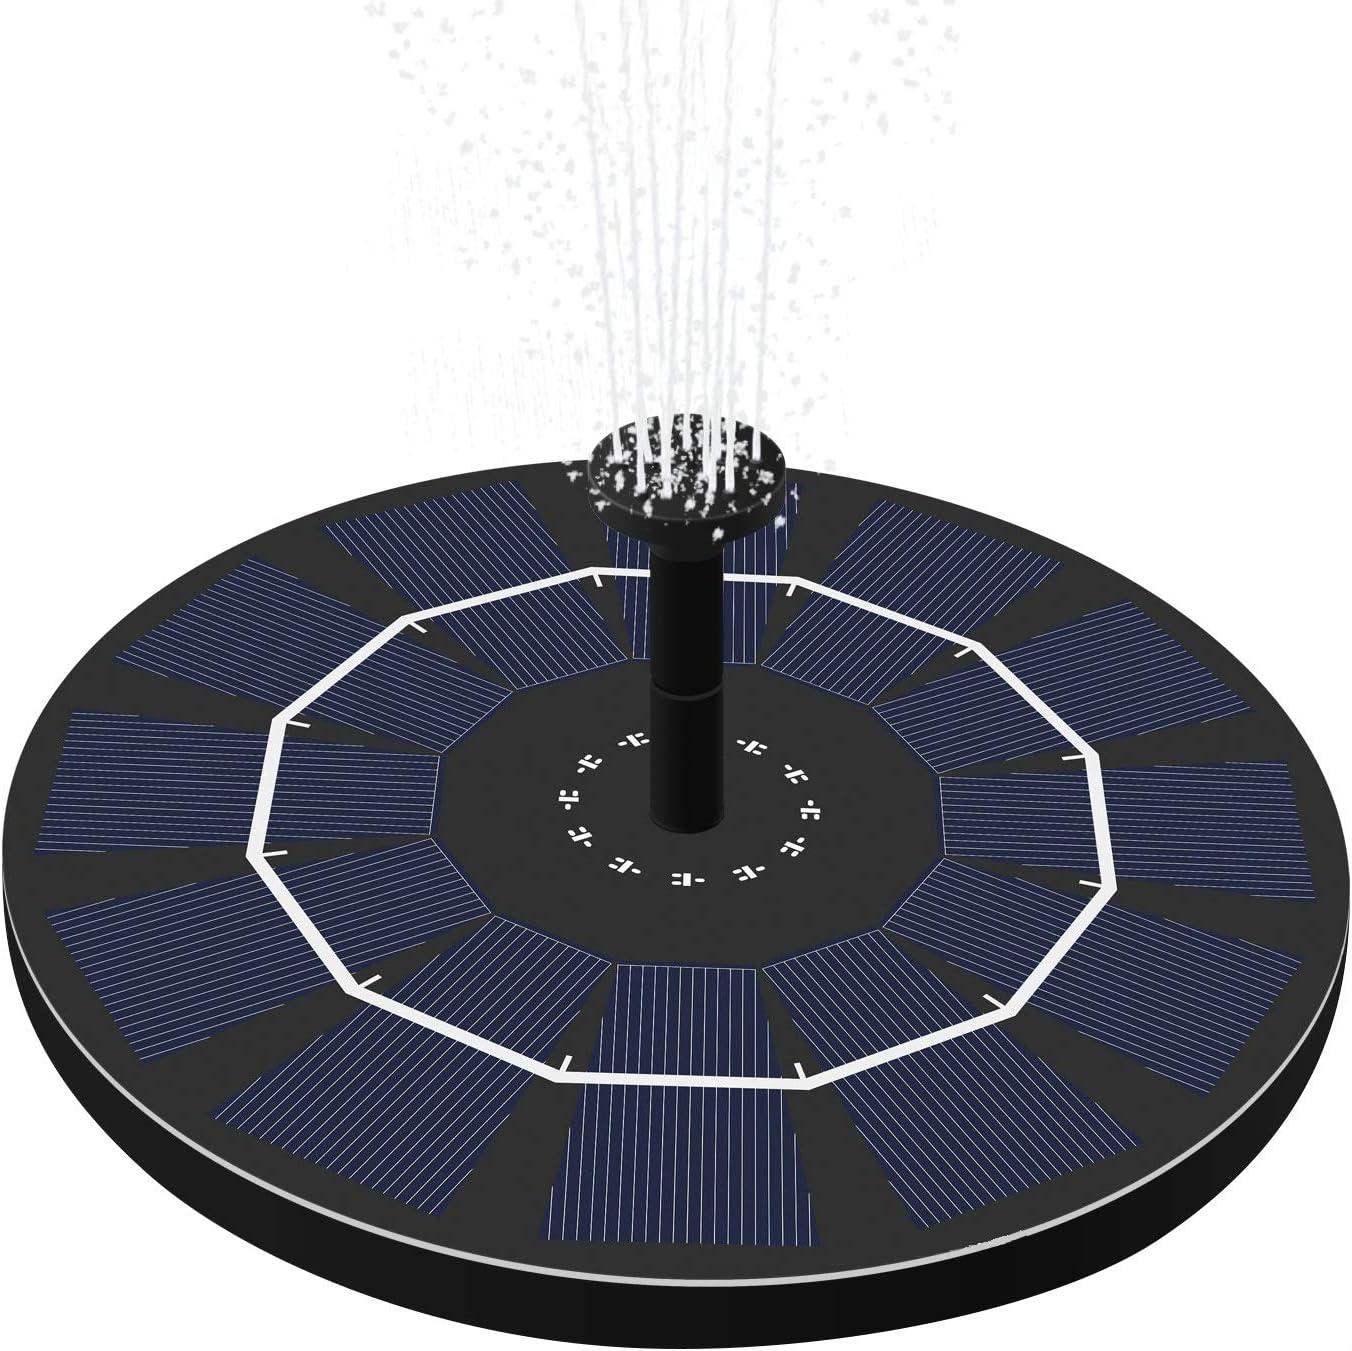 OriFiil Solar Bombas para Fuentes Ba/ño de Aves 1.8W Bomba de Agua Solar Fotante para Estanque//Piscina de jard/ín 2019 Nuevo Actualizado